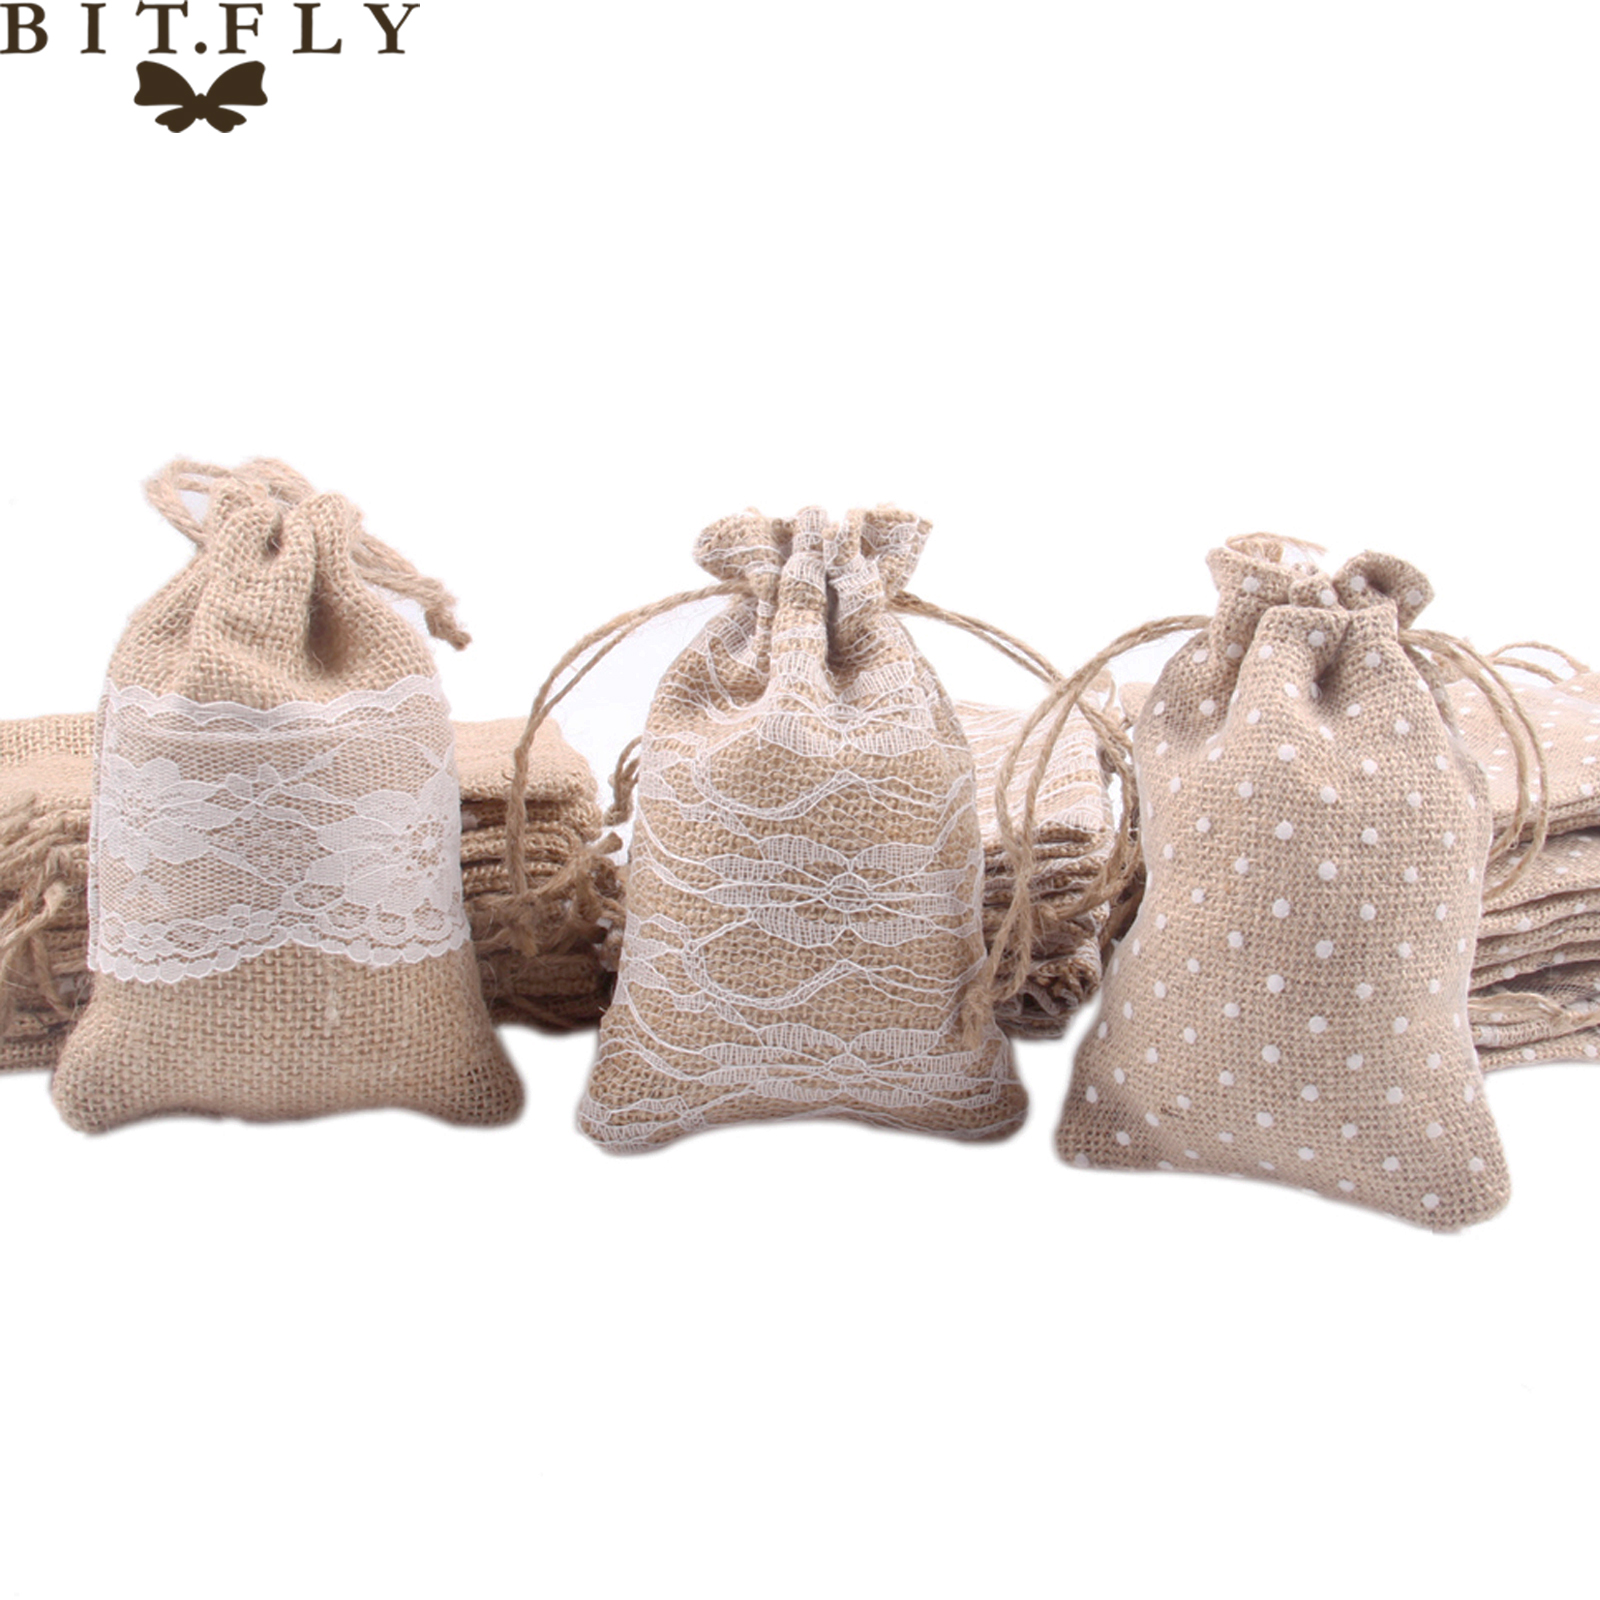 BIT.FLY (10x15cm)Rustic Wedding Decoration Nature Jute Lace Burlap Gift Bag Home Mini Drawstring Storage Bag Christmas Decor